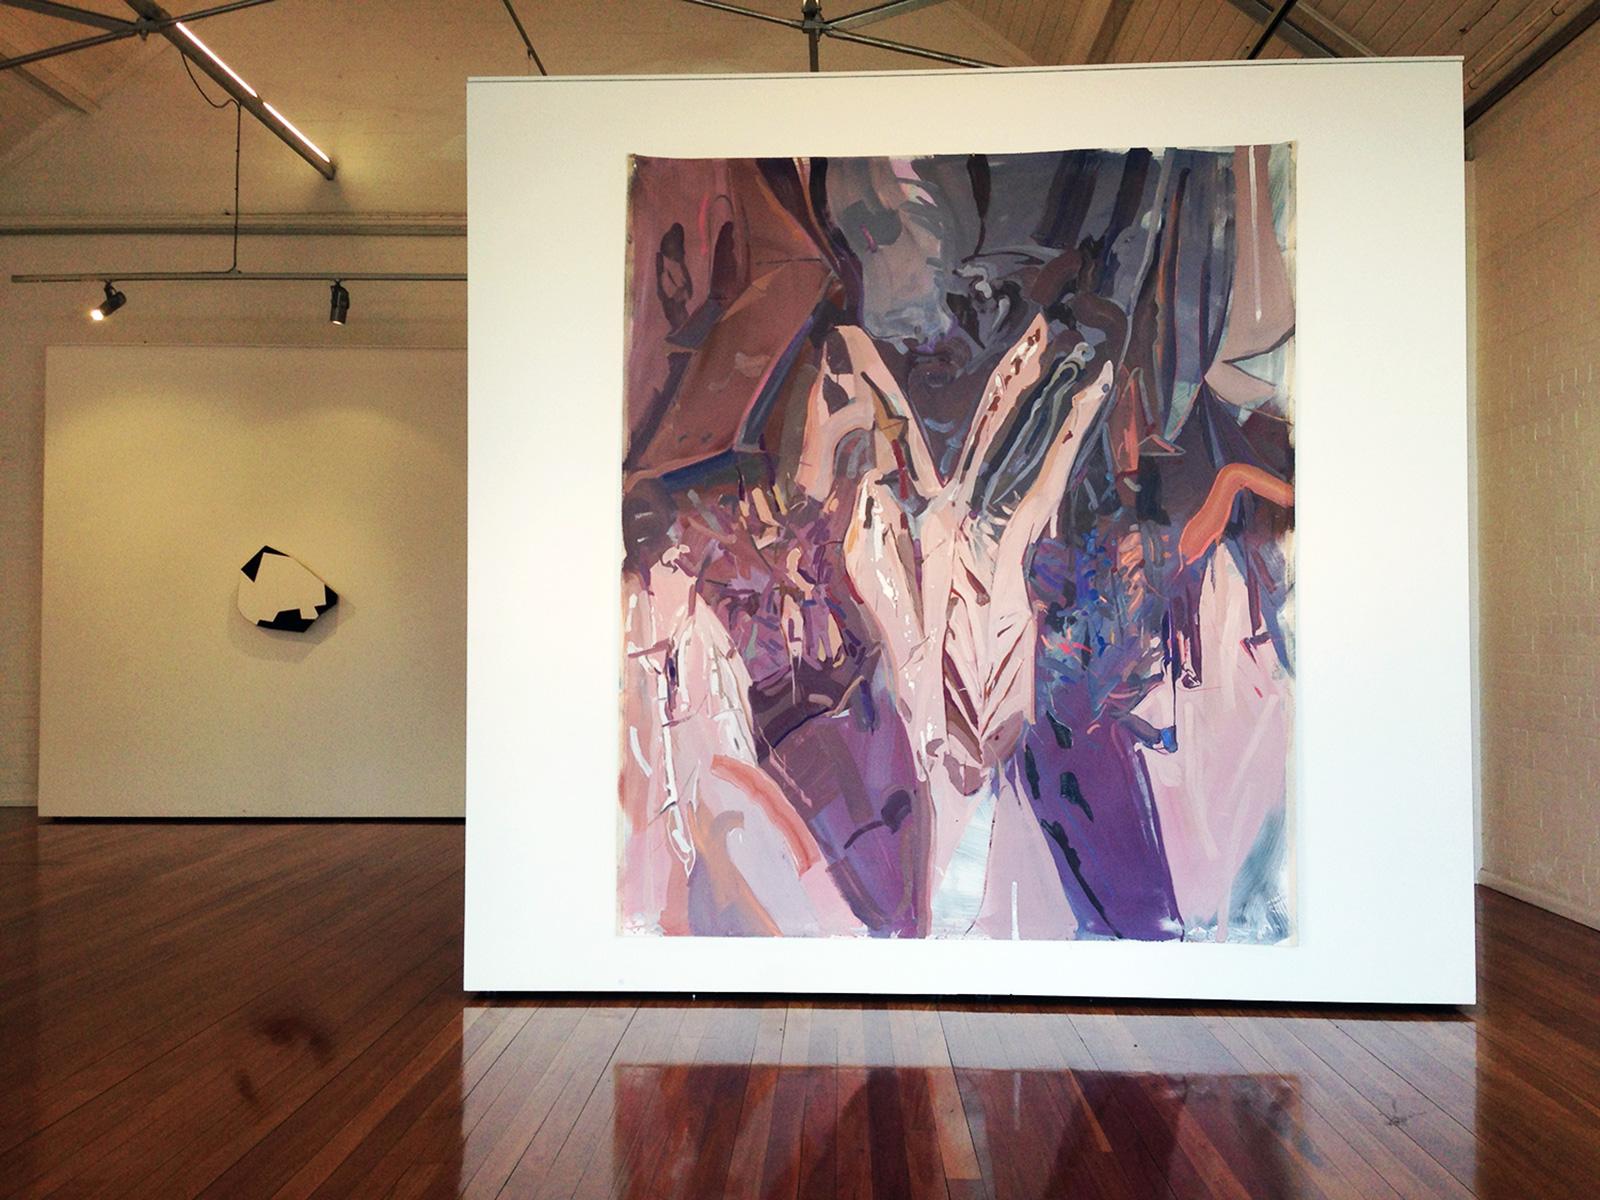 Artereal_Gallery_2014_PAINT14_Gian_Manik_1